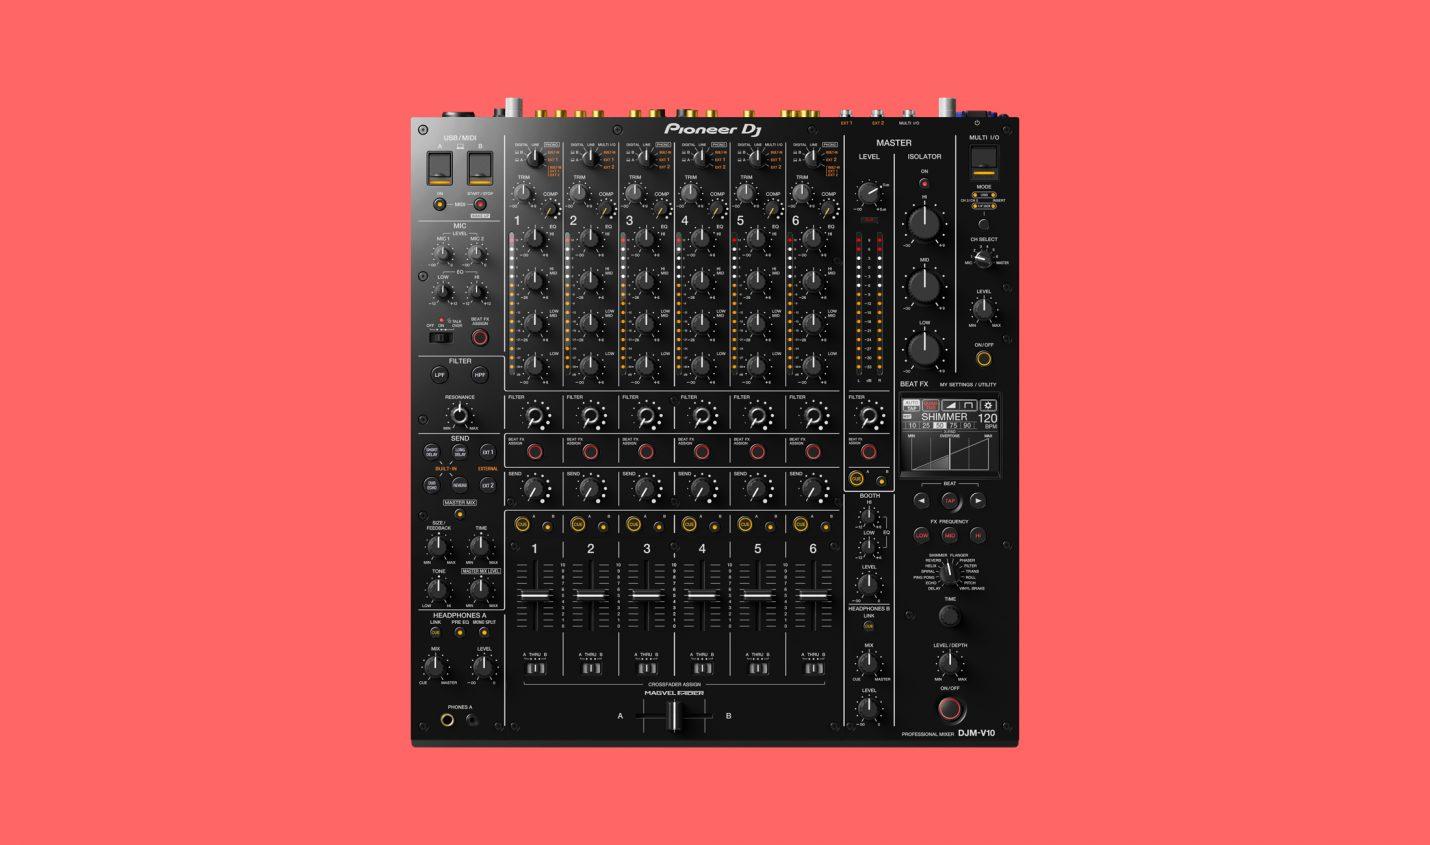 NAMM 2020: Pioneer DJ bringt Flaggschiff DJM-V10 heraus